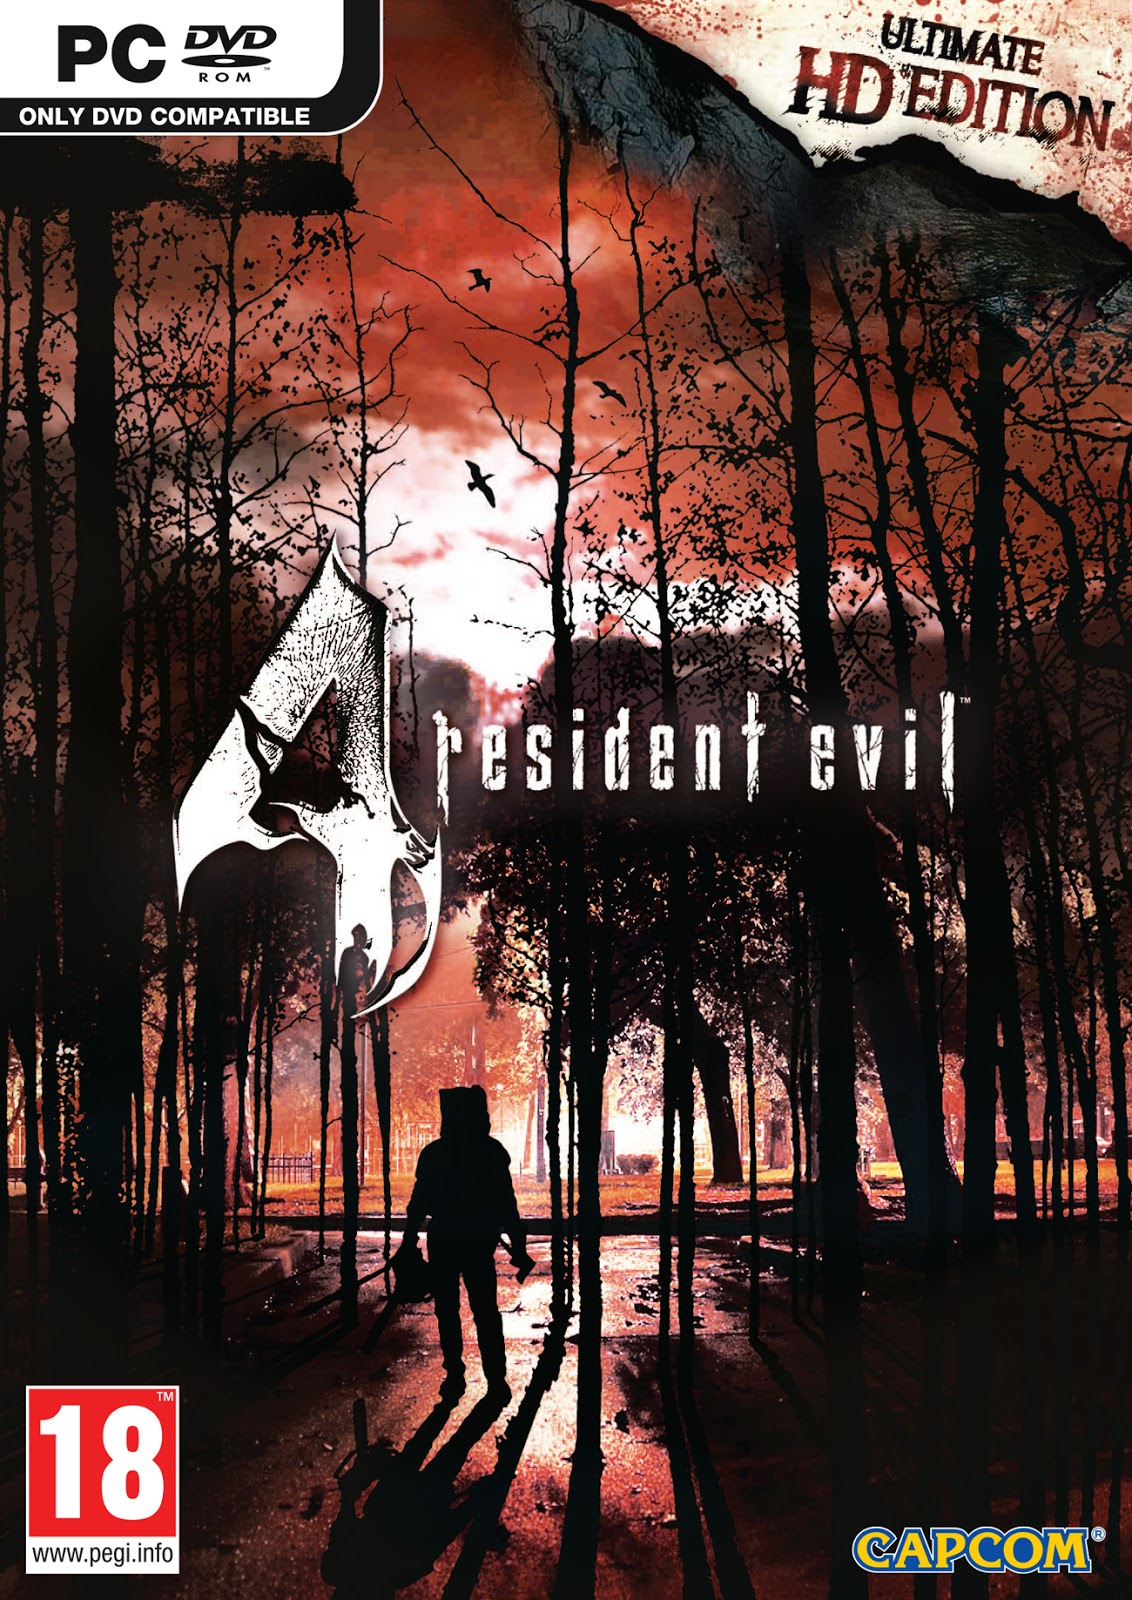 Descargar Resident Evil 4 Ultimate HD Edition PC Cover Caratula